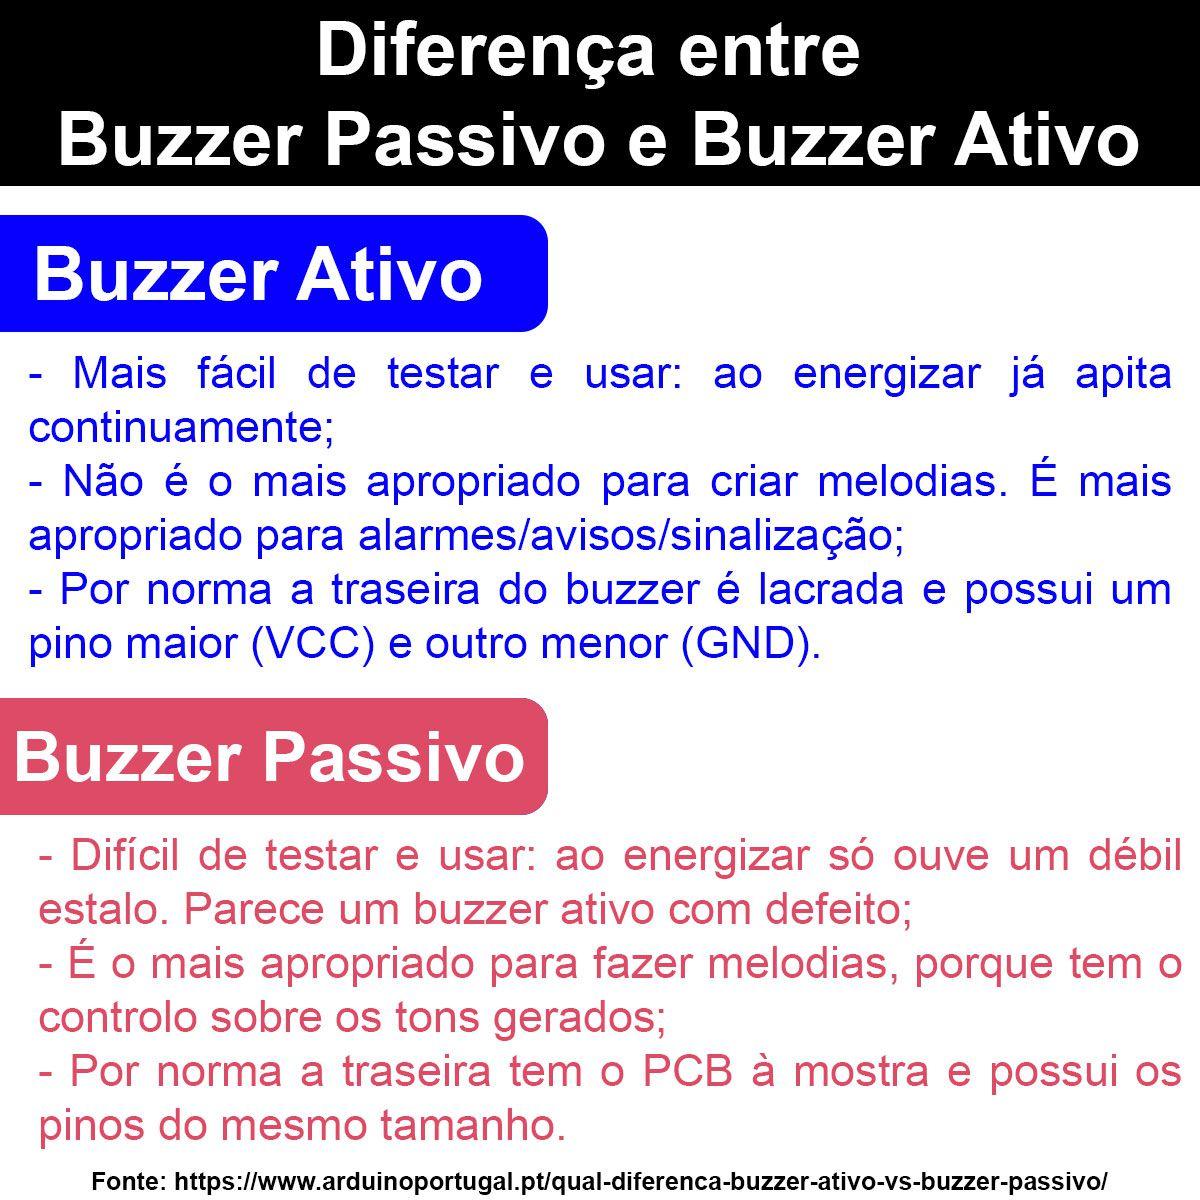 3x Buzzer Passivo 5v